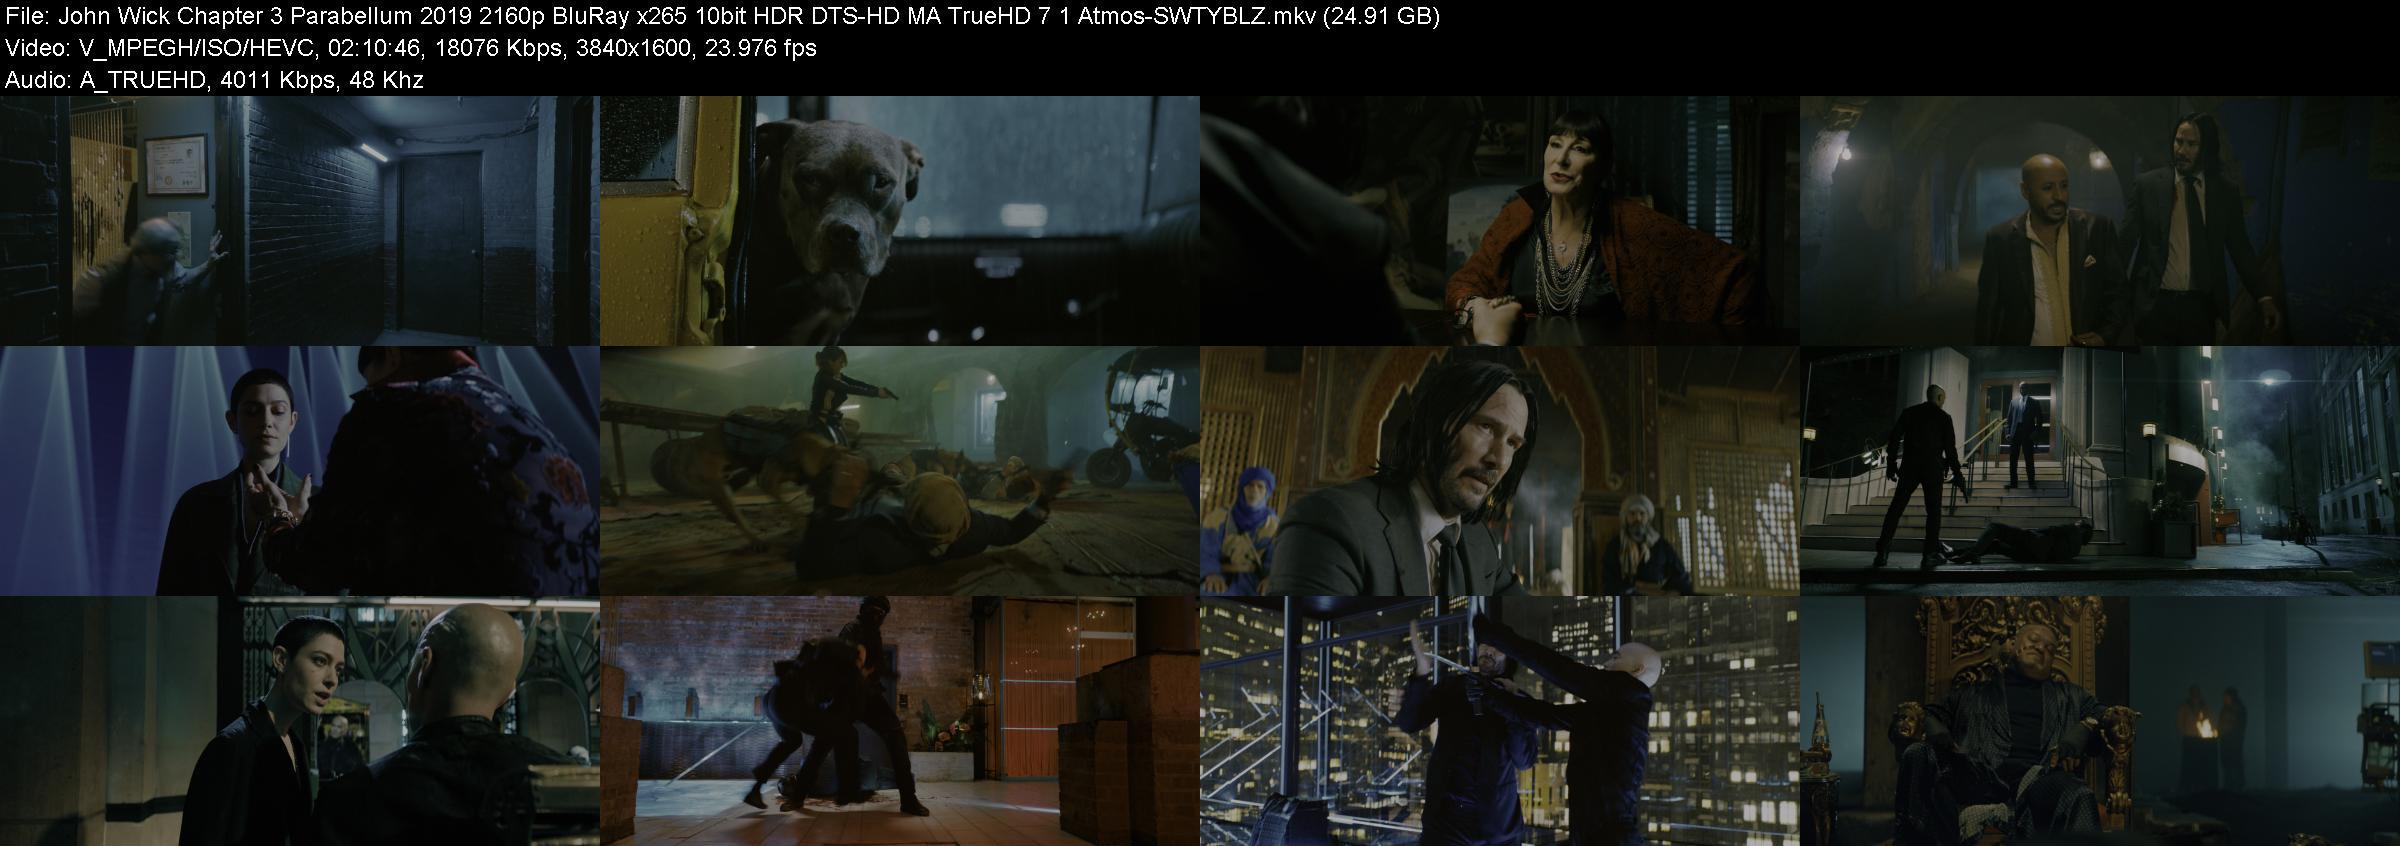 John Wick Chapter 3 Parabellum 2019 2160p BluRay x265 10bit HDR DTS-HD MA TrueHD 7...